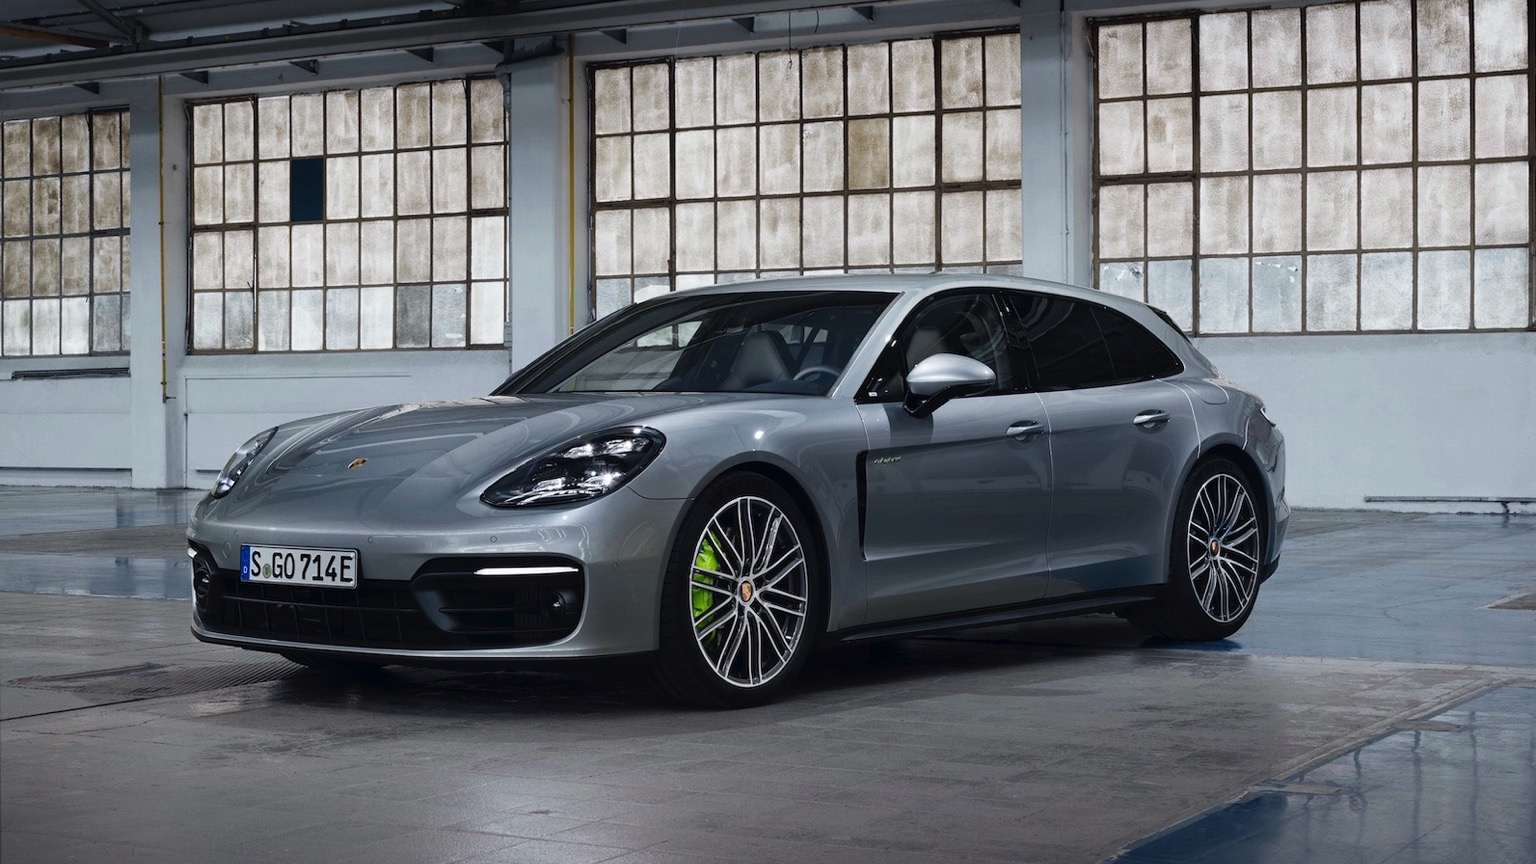 Porsche Panamera Sport Turismo 4 E-Hybrid (2020)